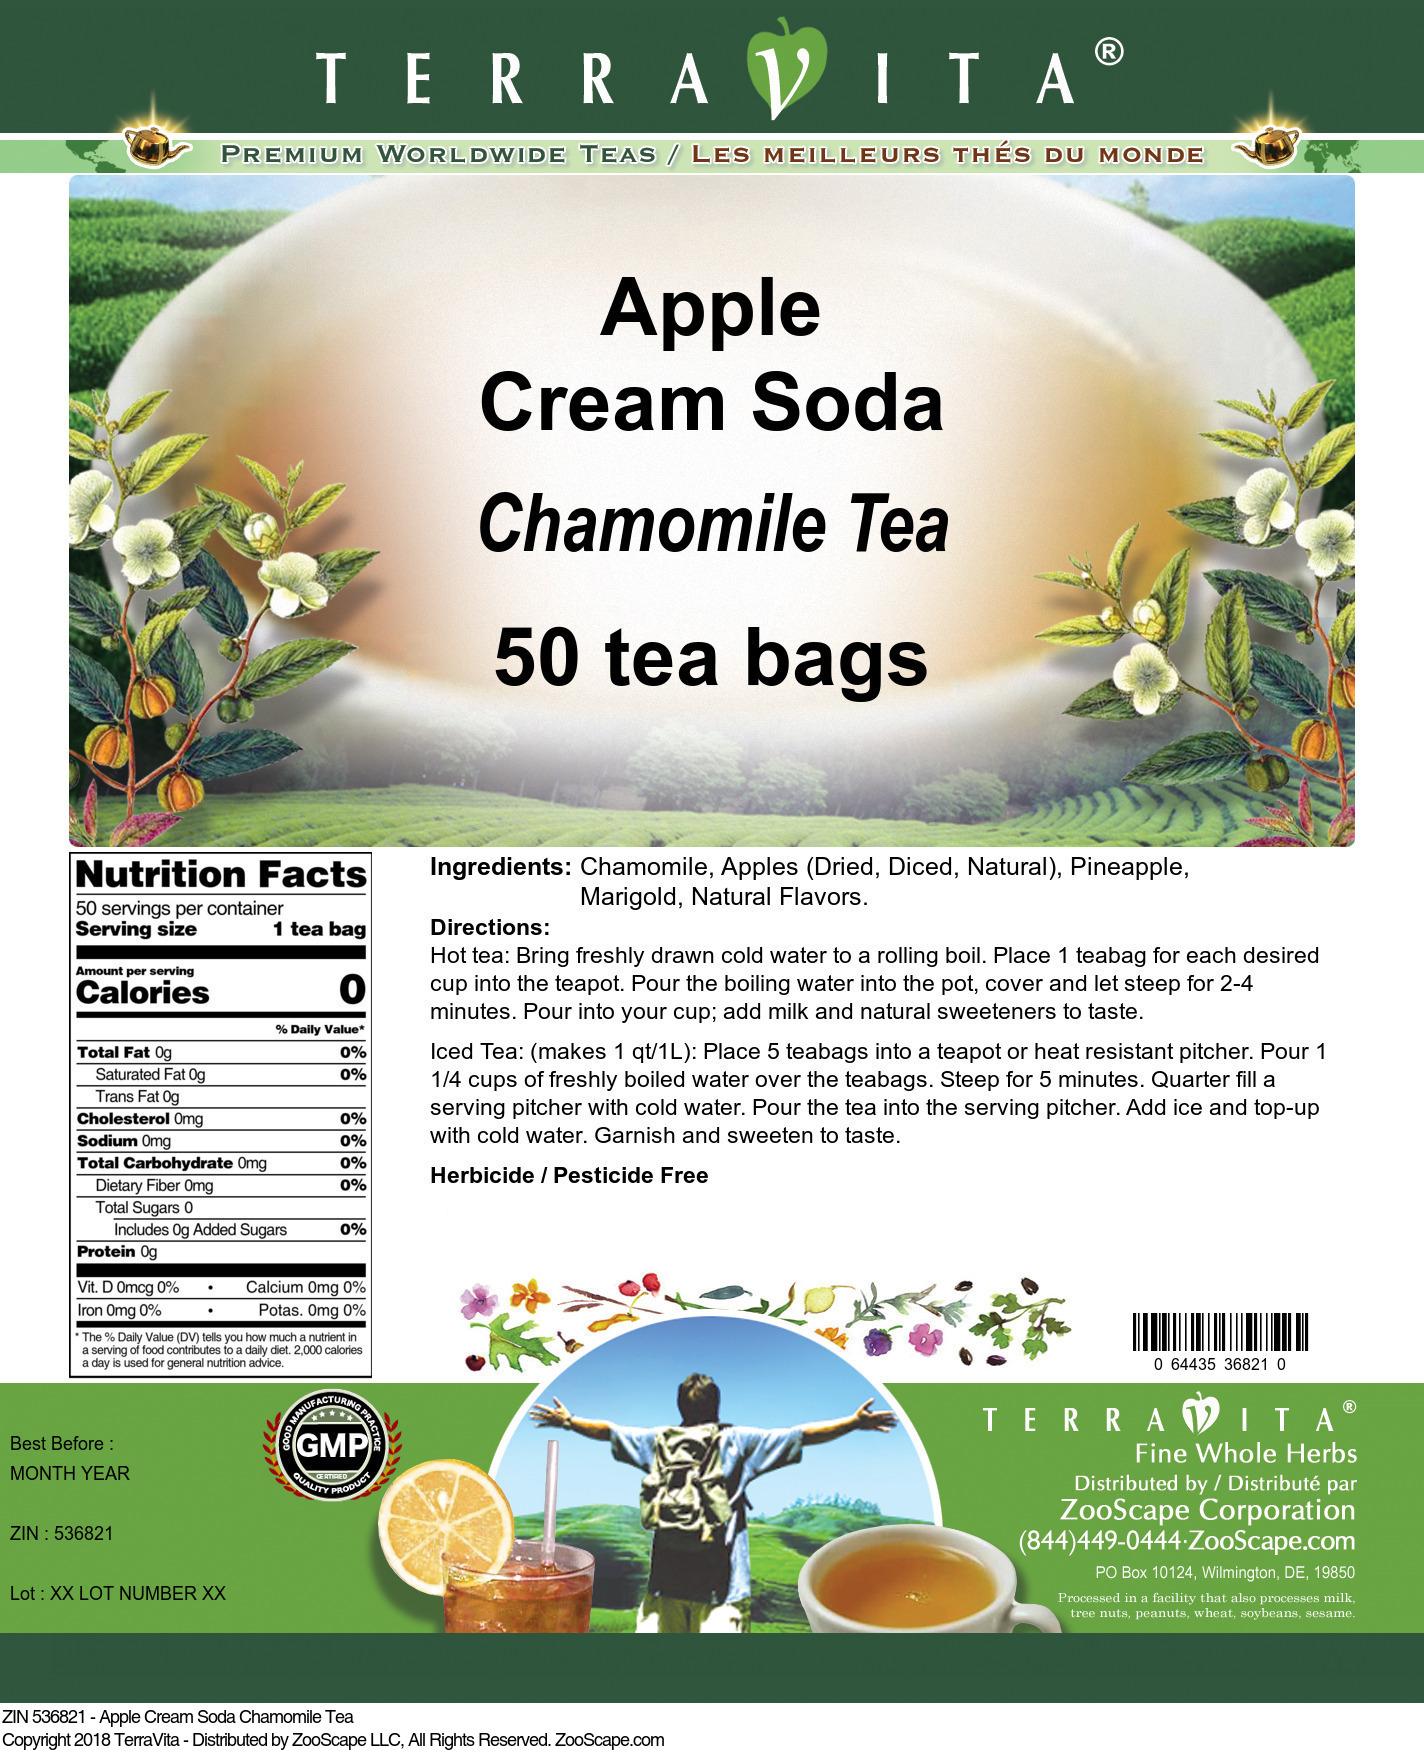 Apple Cream Soda Chamomile Tea